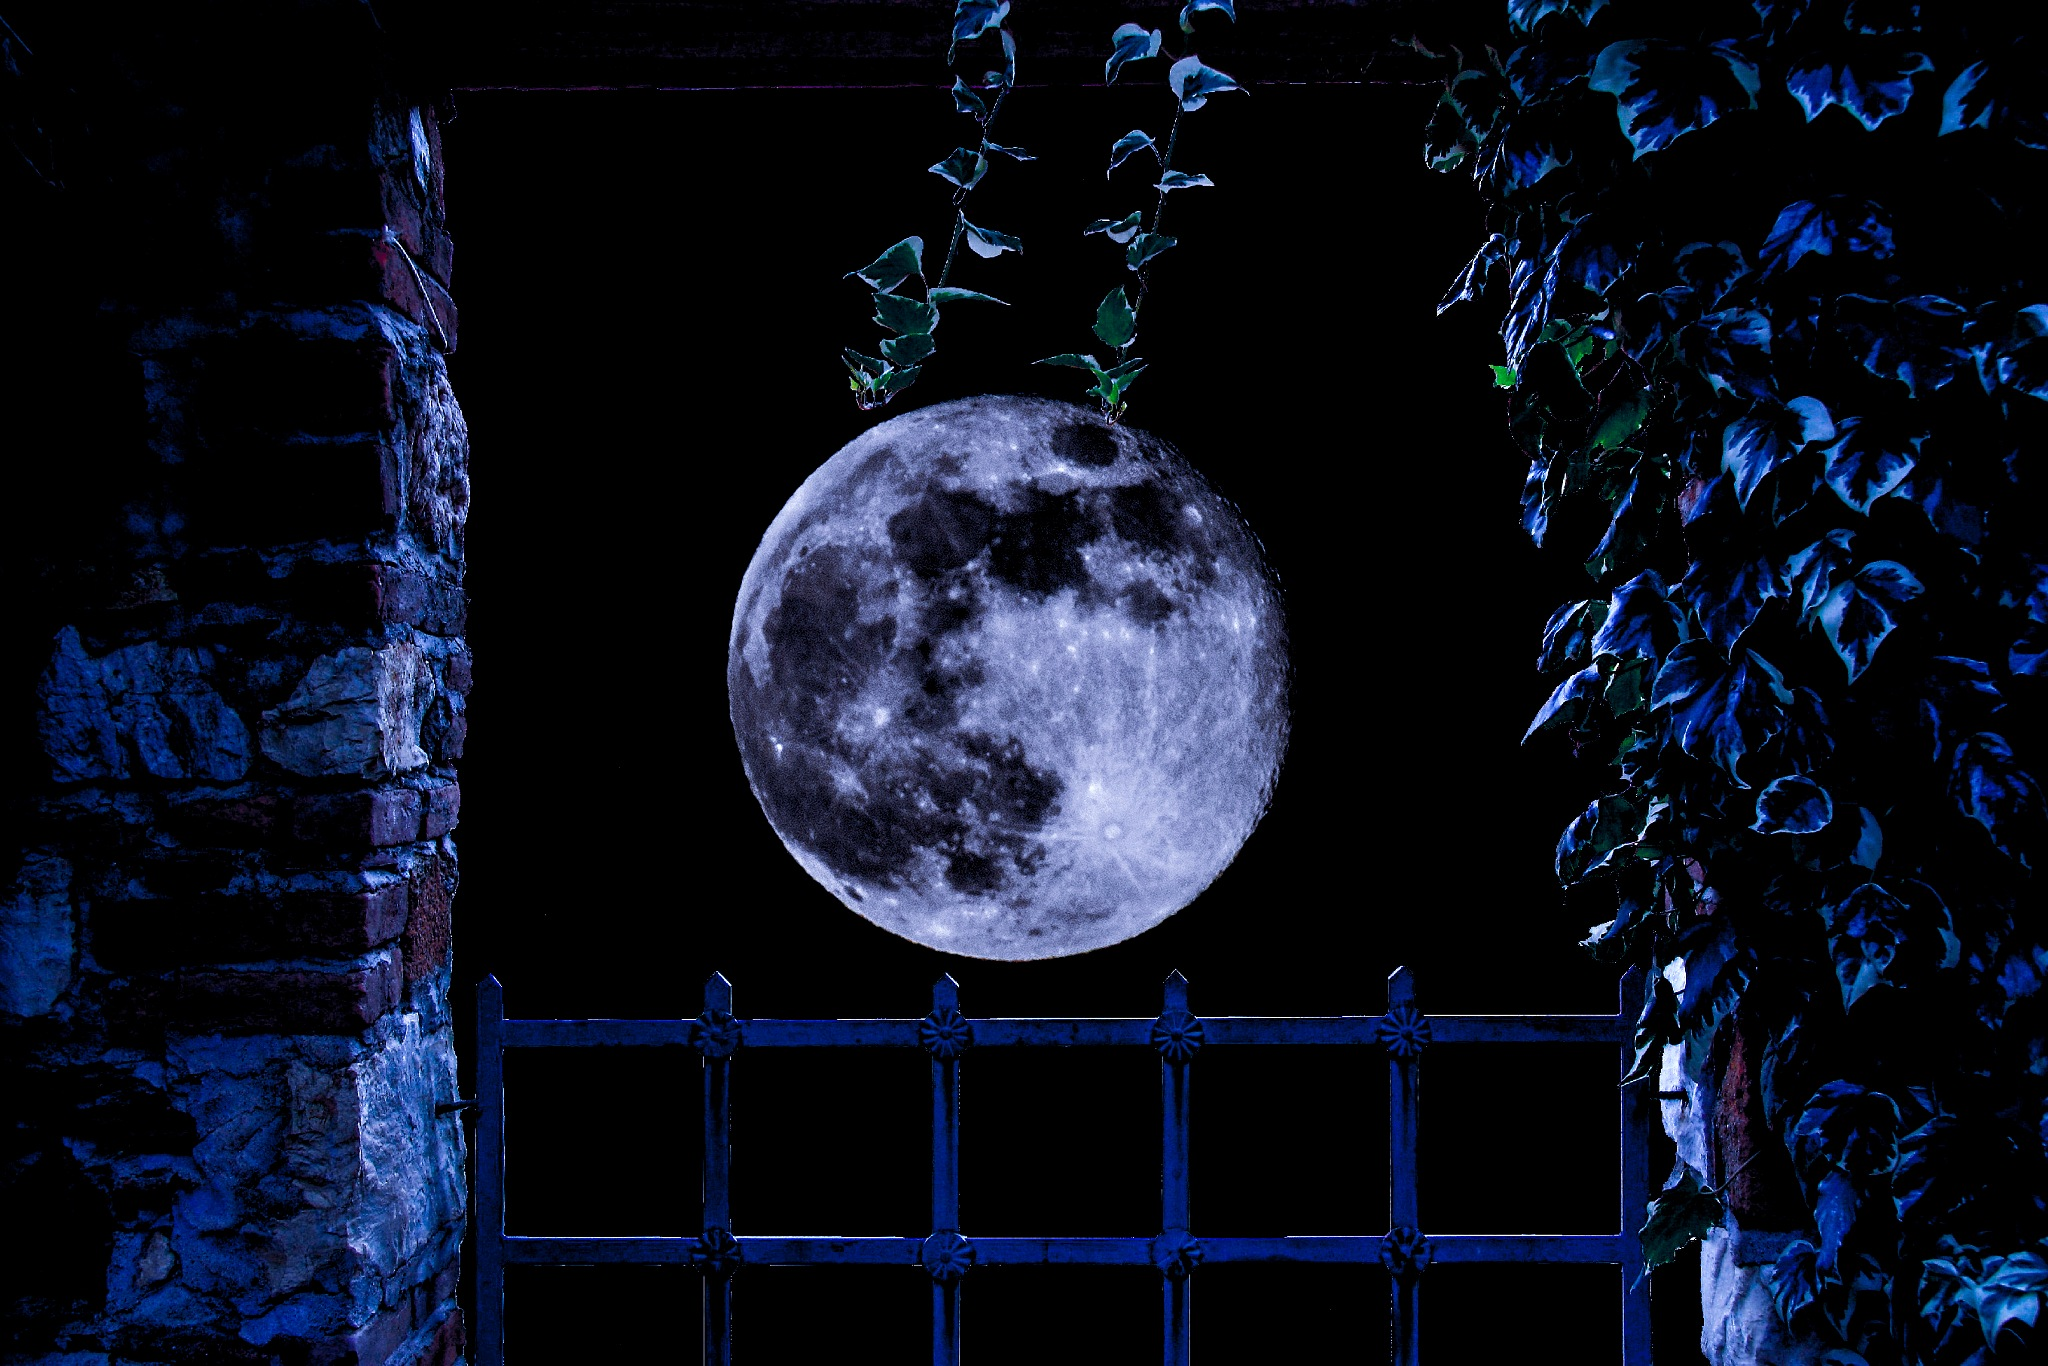 The night with a fool moon over my garden by Goran Jorganovich